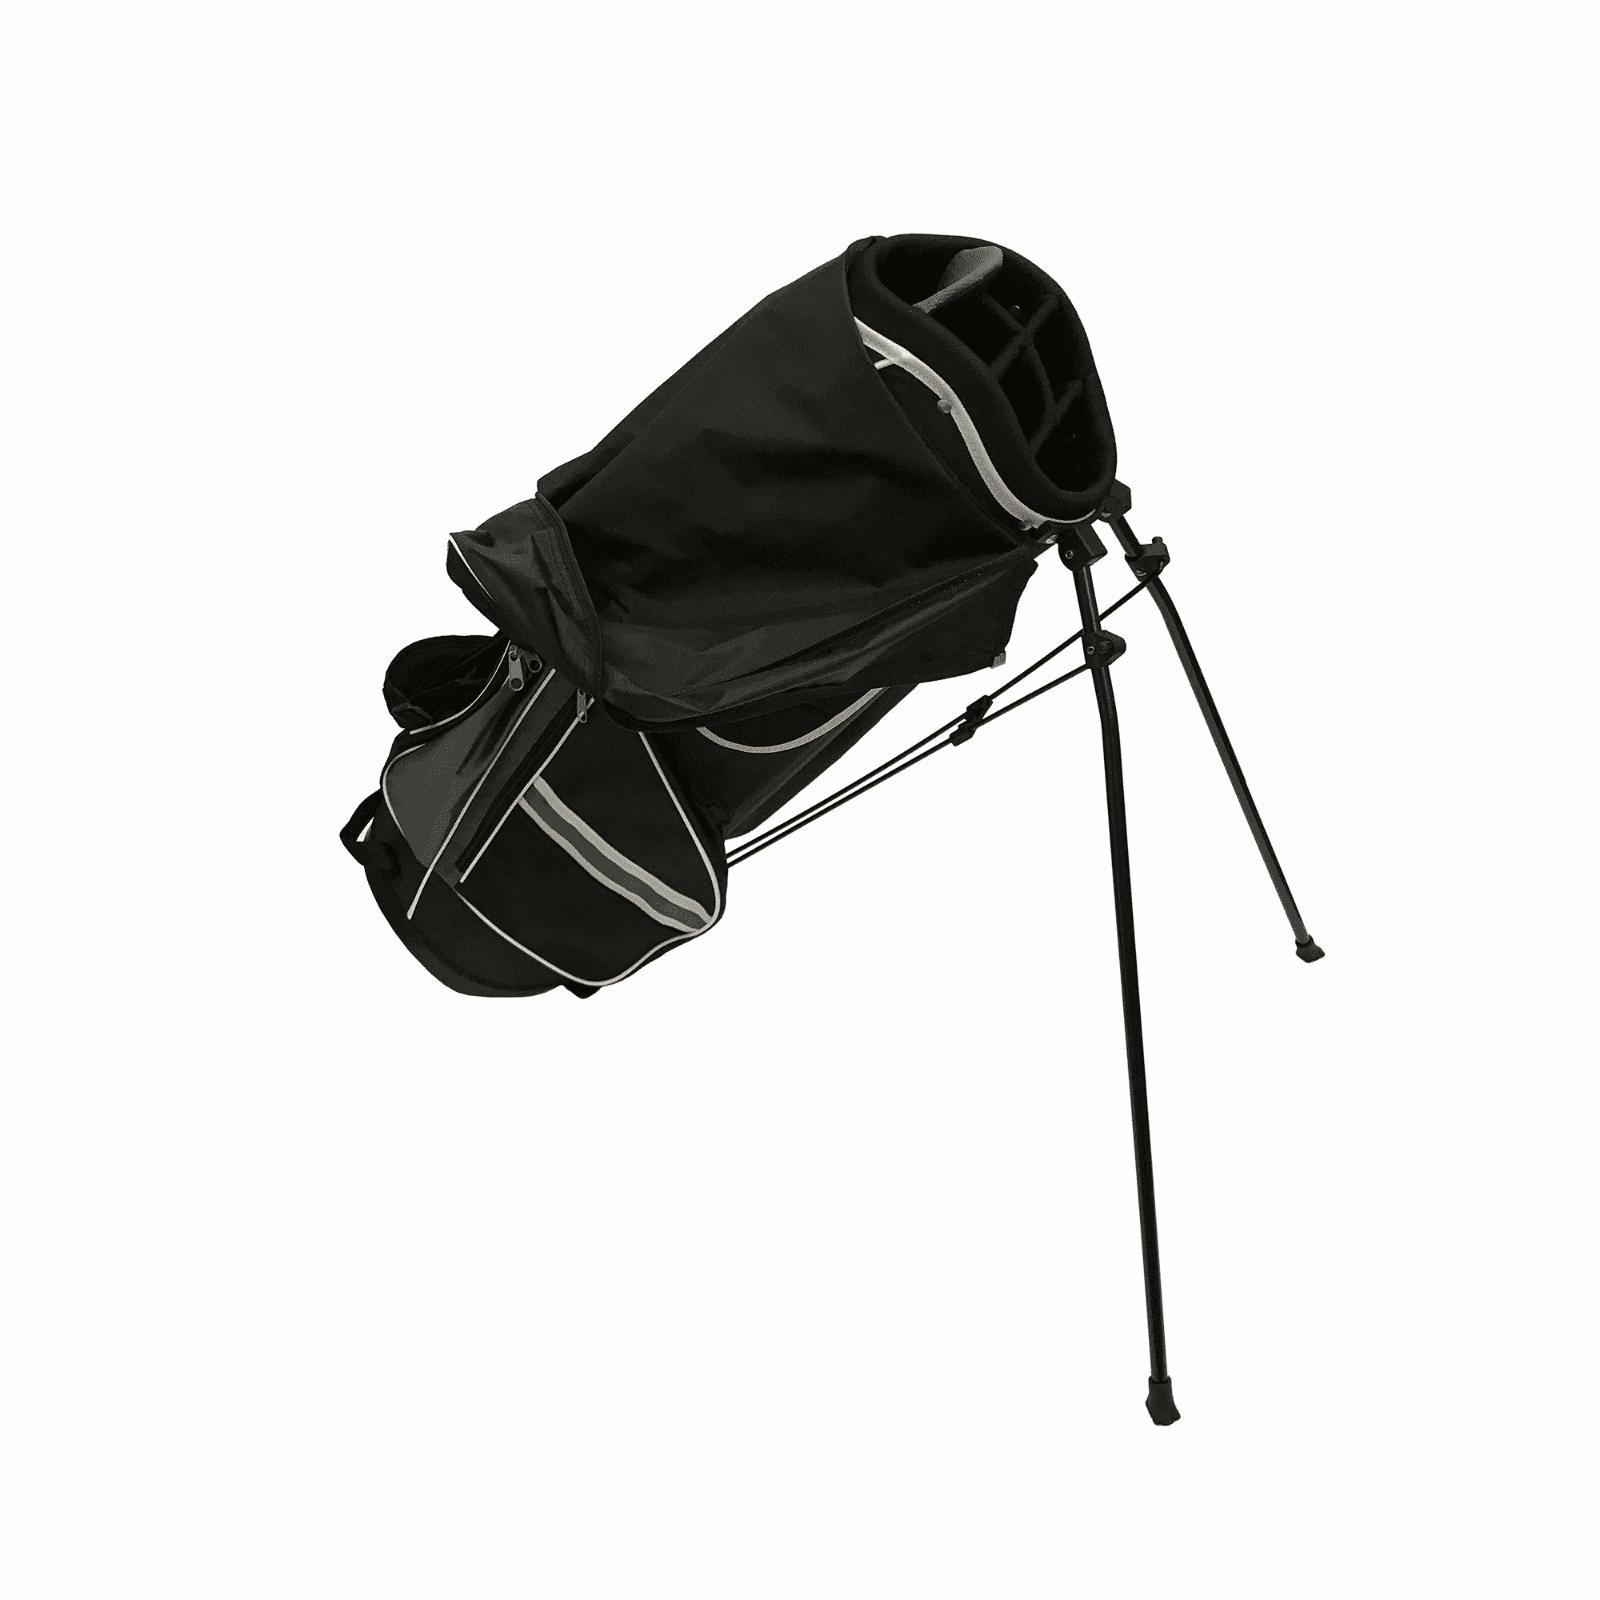 Mens Golf Bag Way Carry Standing Rain Hood